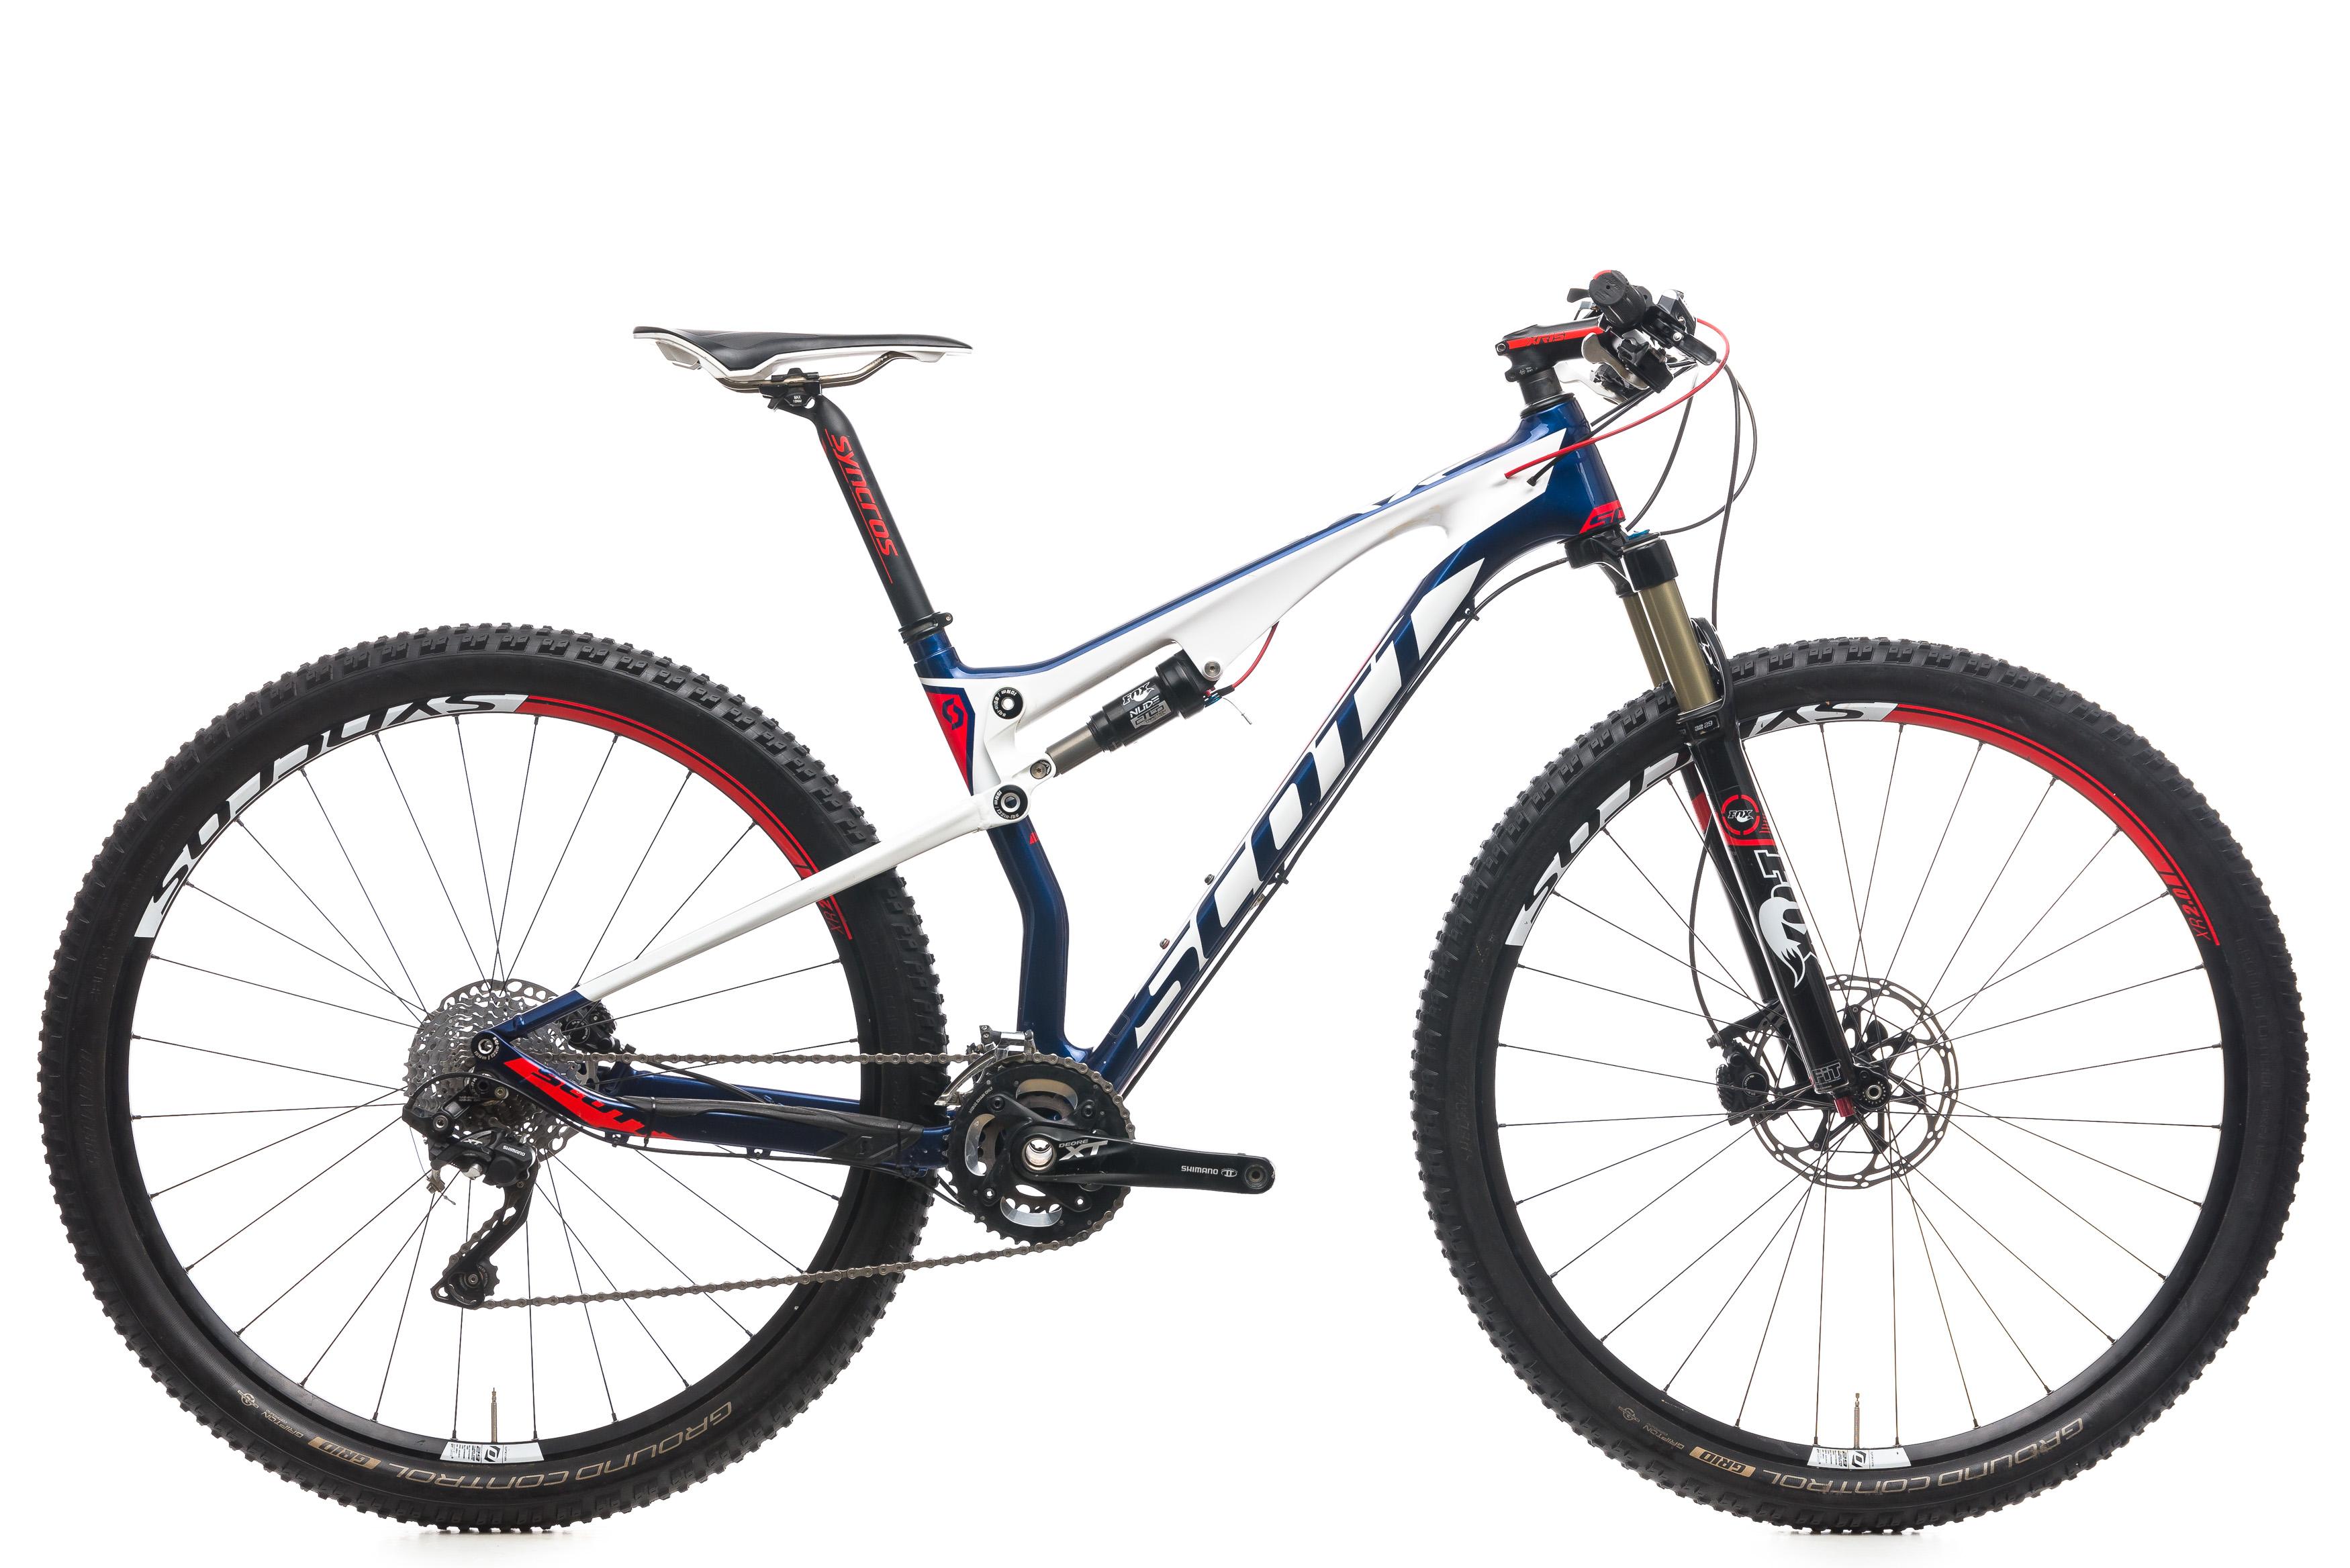 7ef8ca5946f 2015 Scott Spark 910 Mountain Bike Medium 29